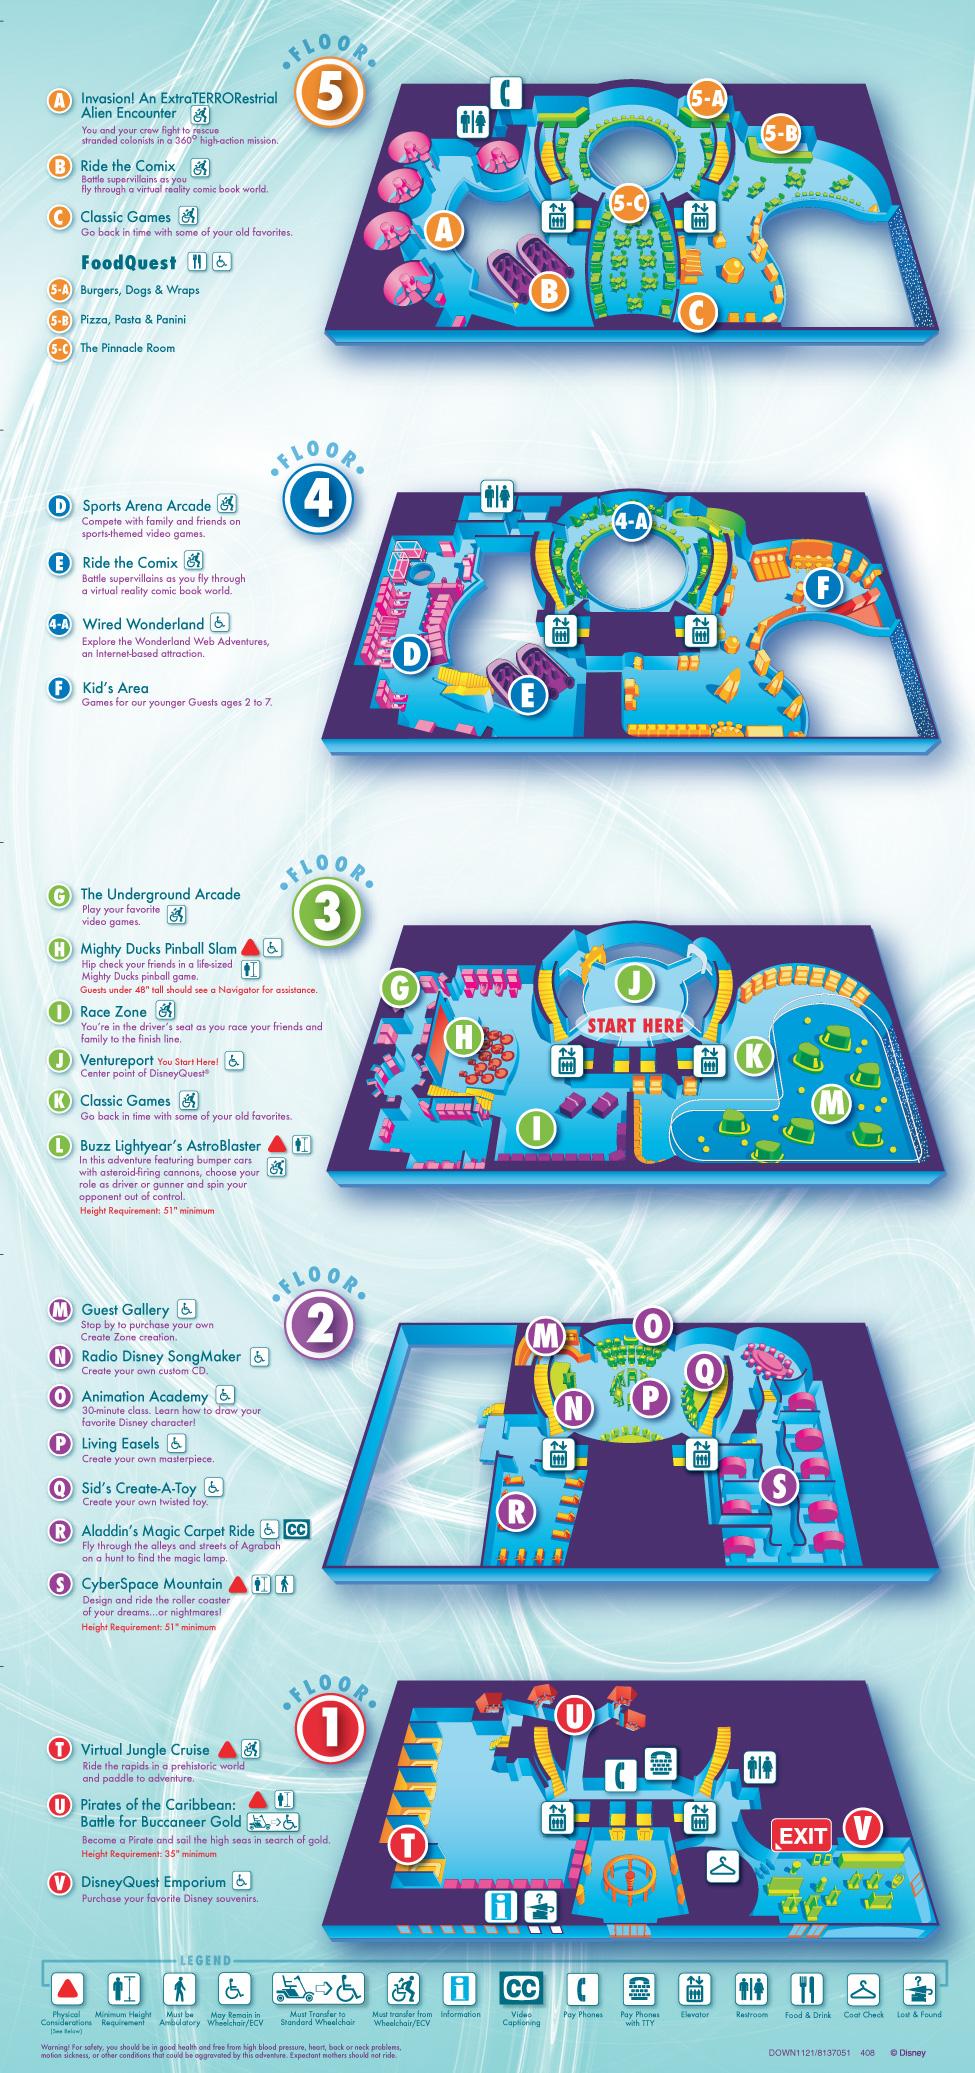 Disney Quest map - Photo 1 of 1